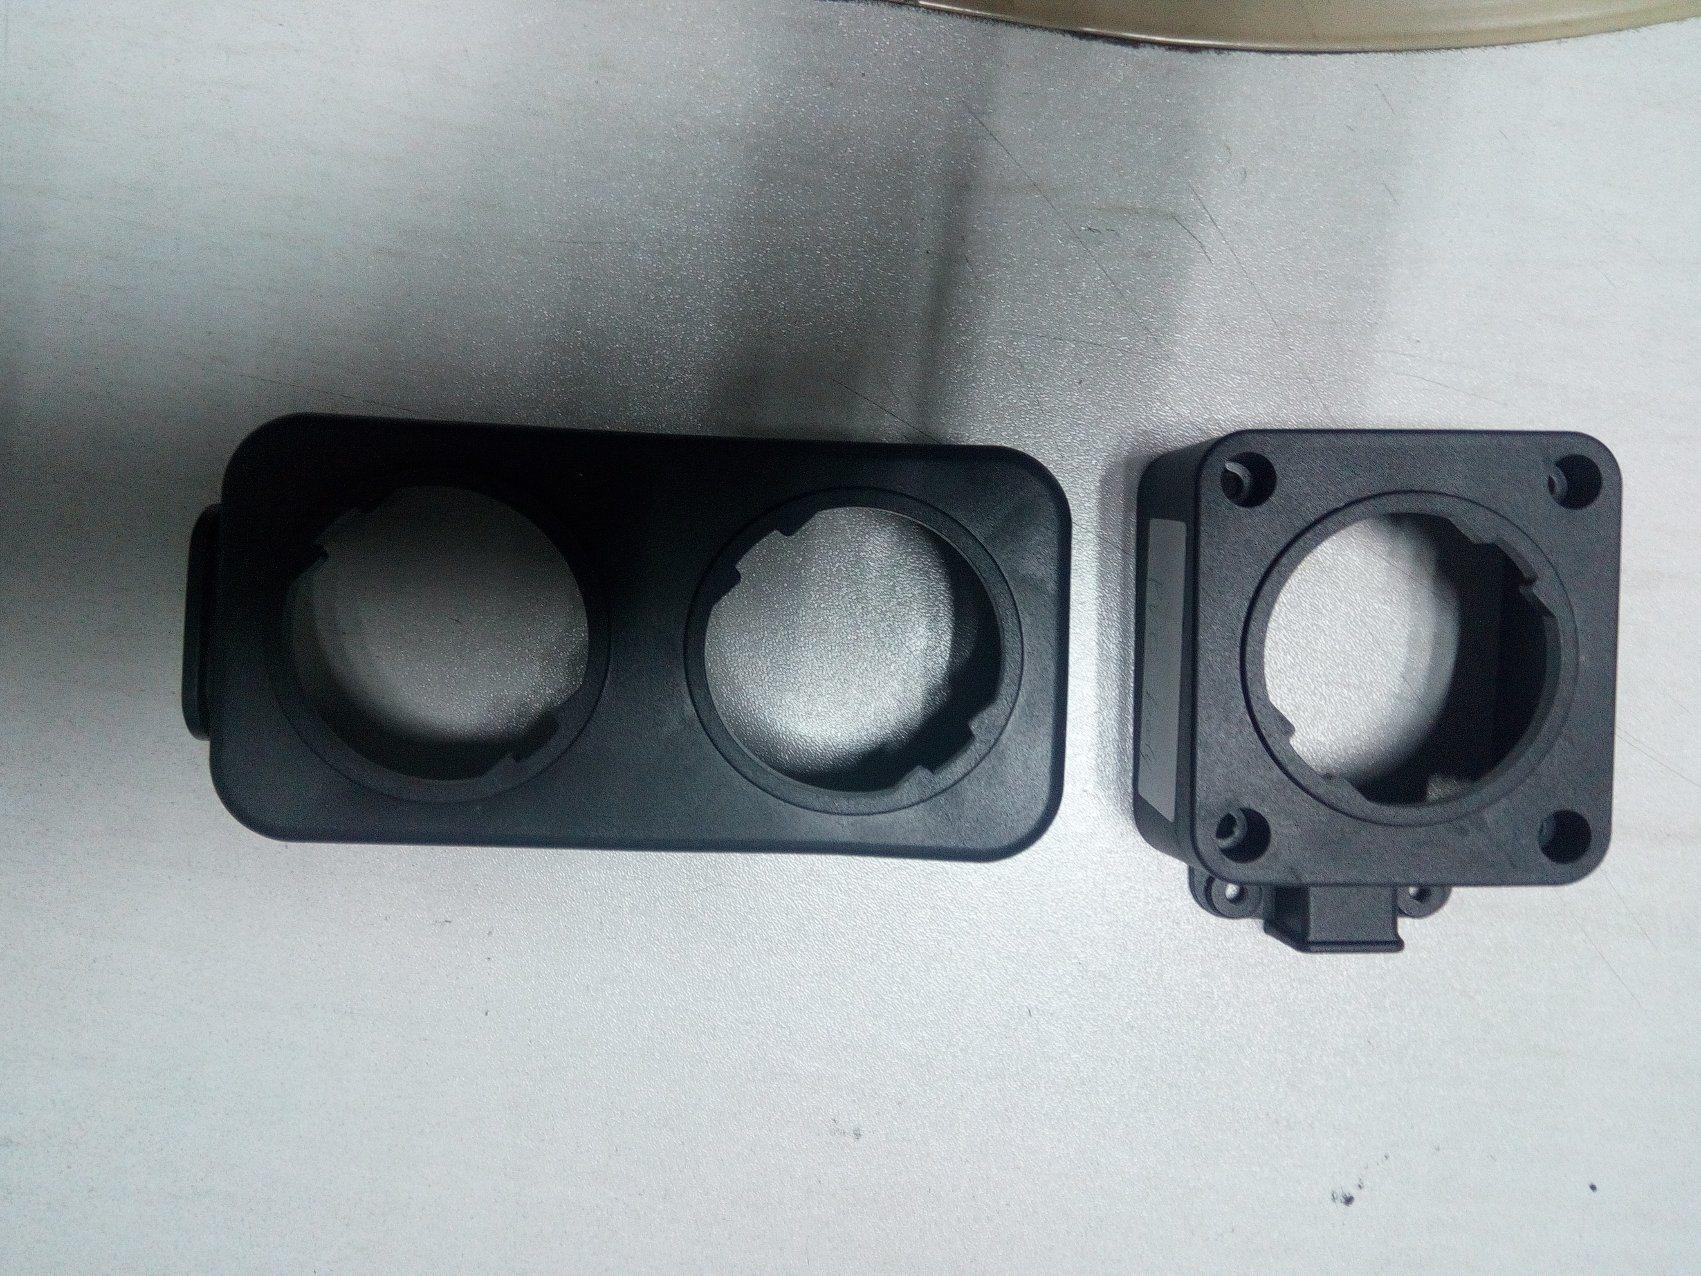 China Elendax Industrial Black EU 3 Way Socket Outlet - 16A IP44 ...